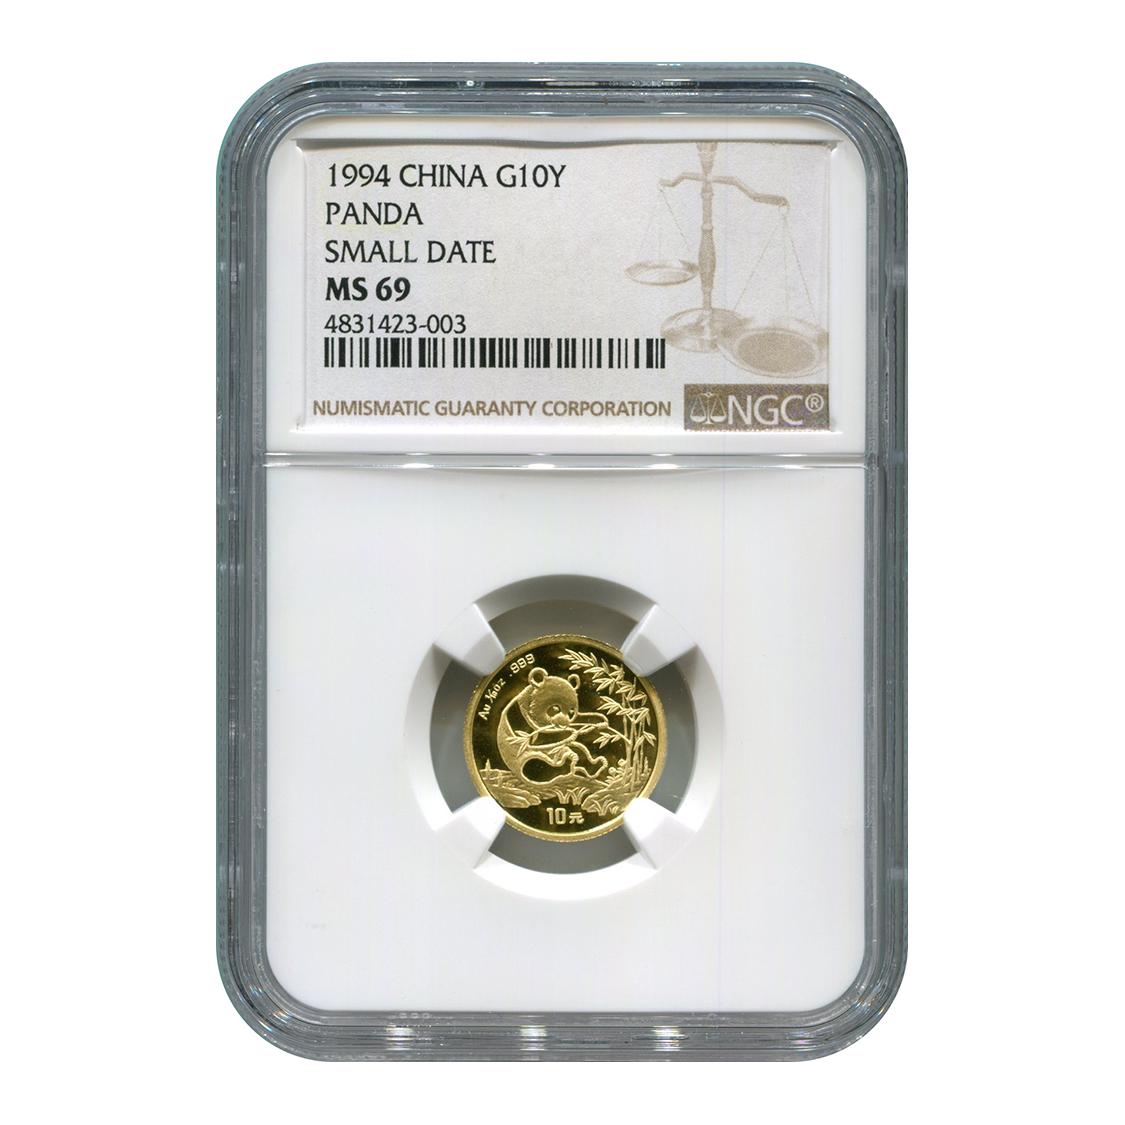 Certified Tenth Ounce Chinese Gold Panda 1994 Small Date 10 Yuan MS69 NGC